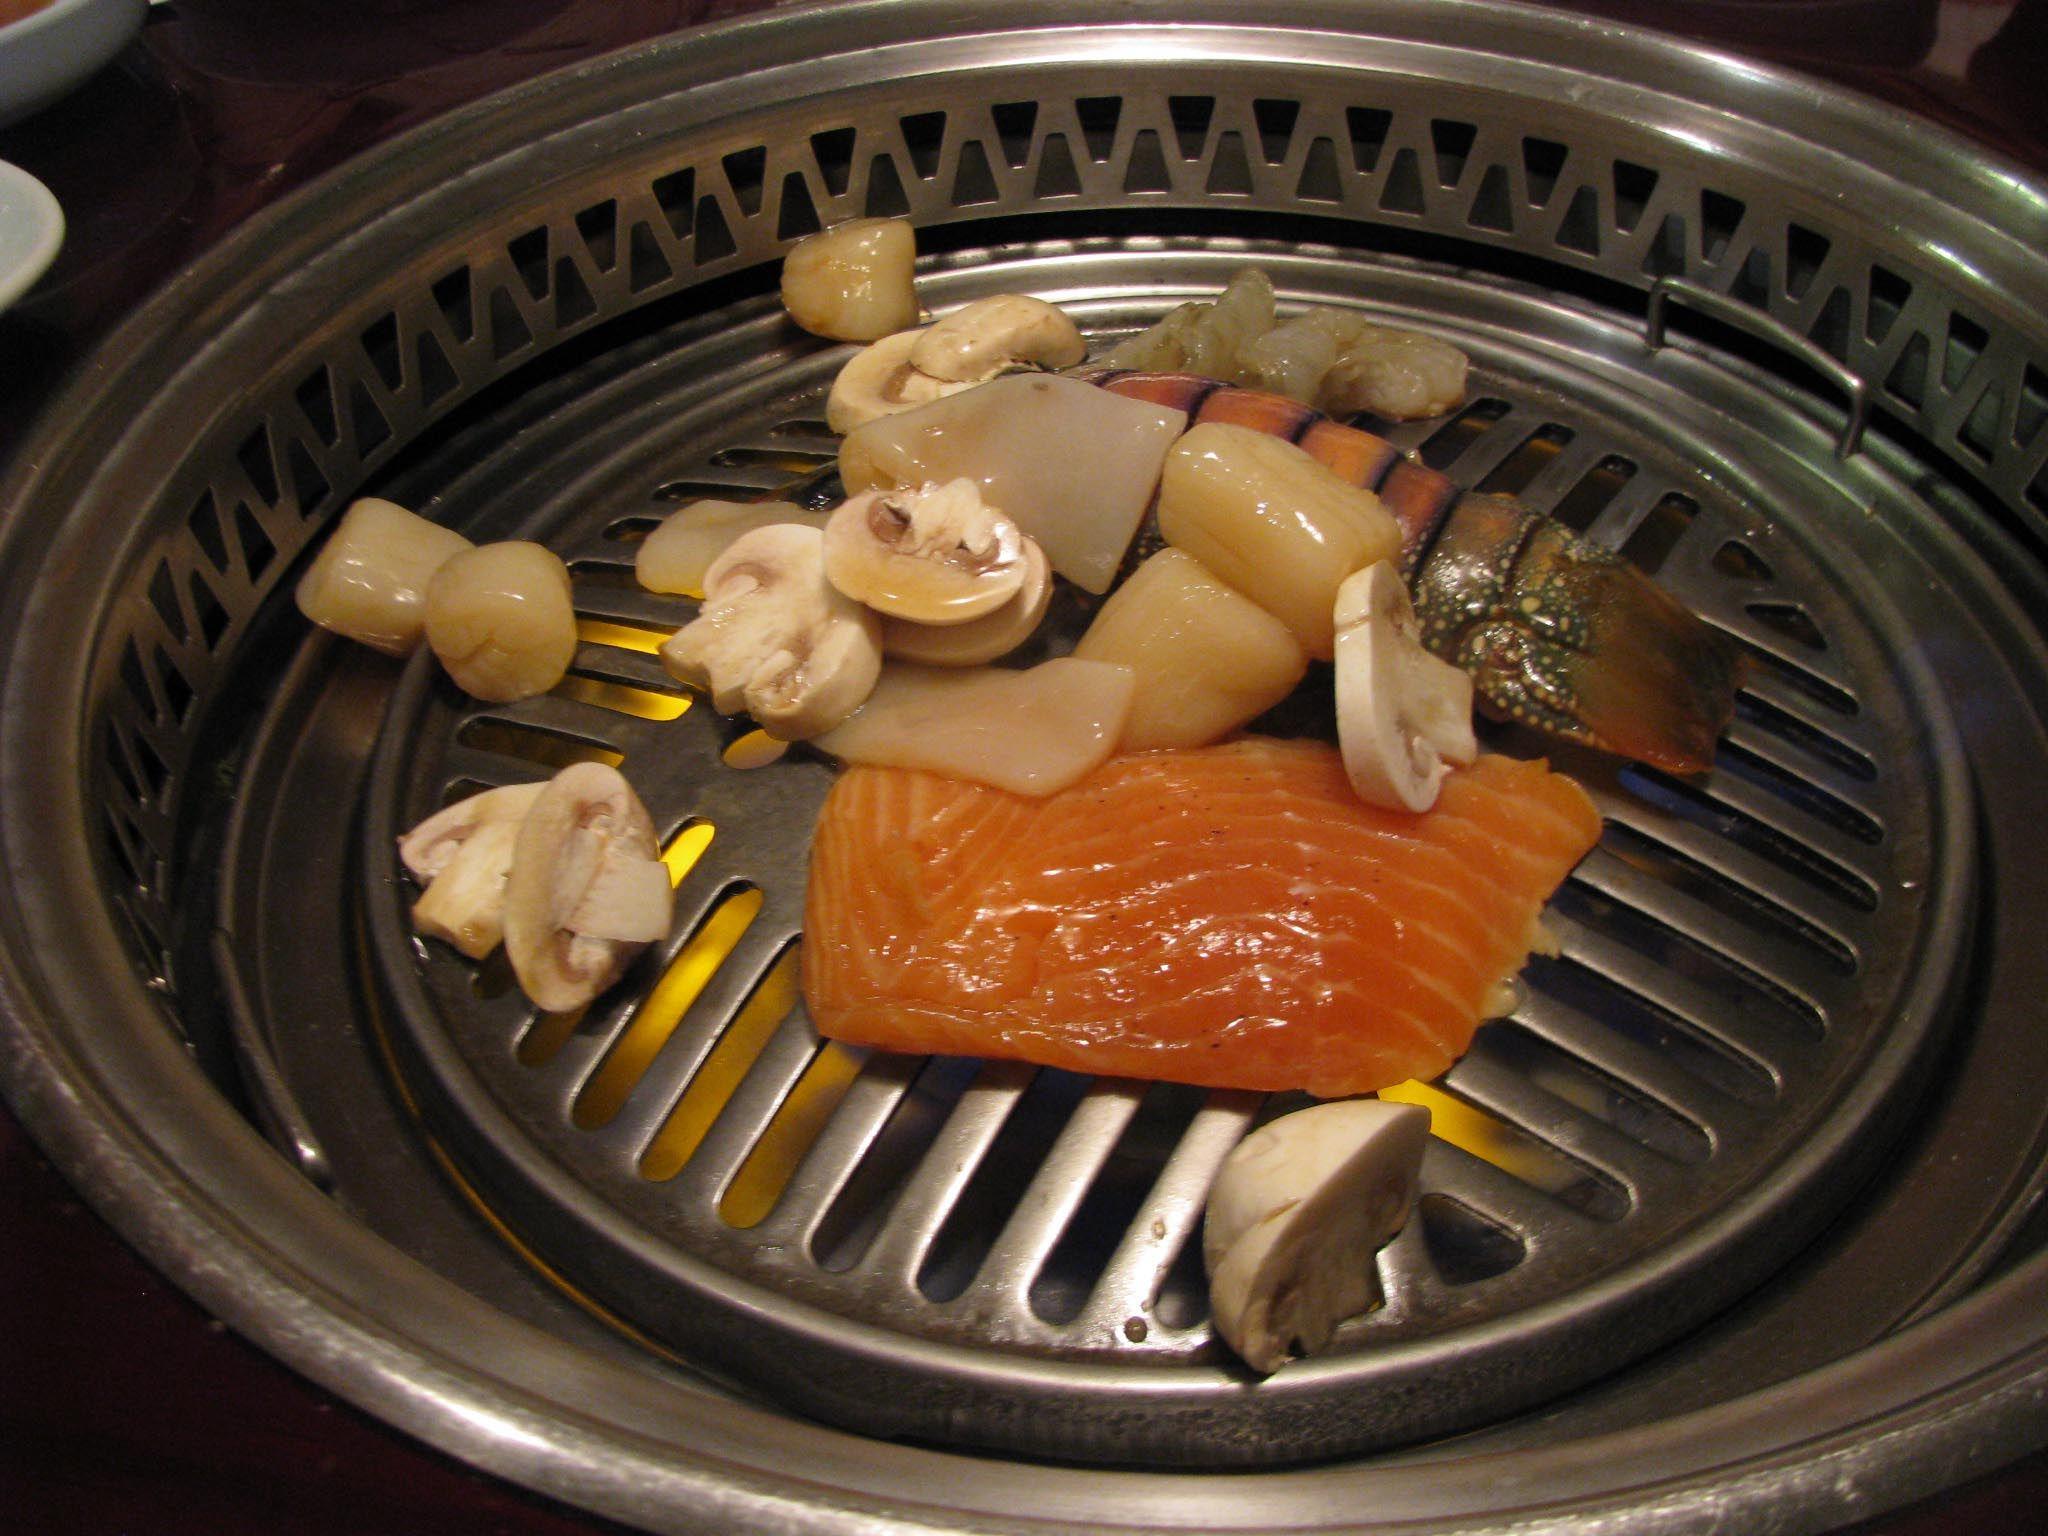 Korean BBQ Table Top Grill | BBQ | Pinterest | Table top grill, Bbq ...